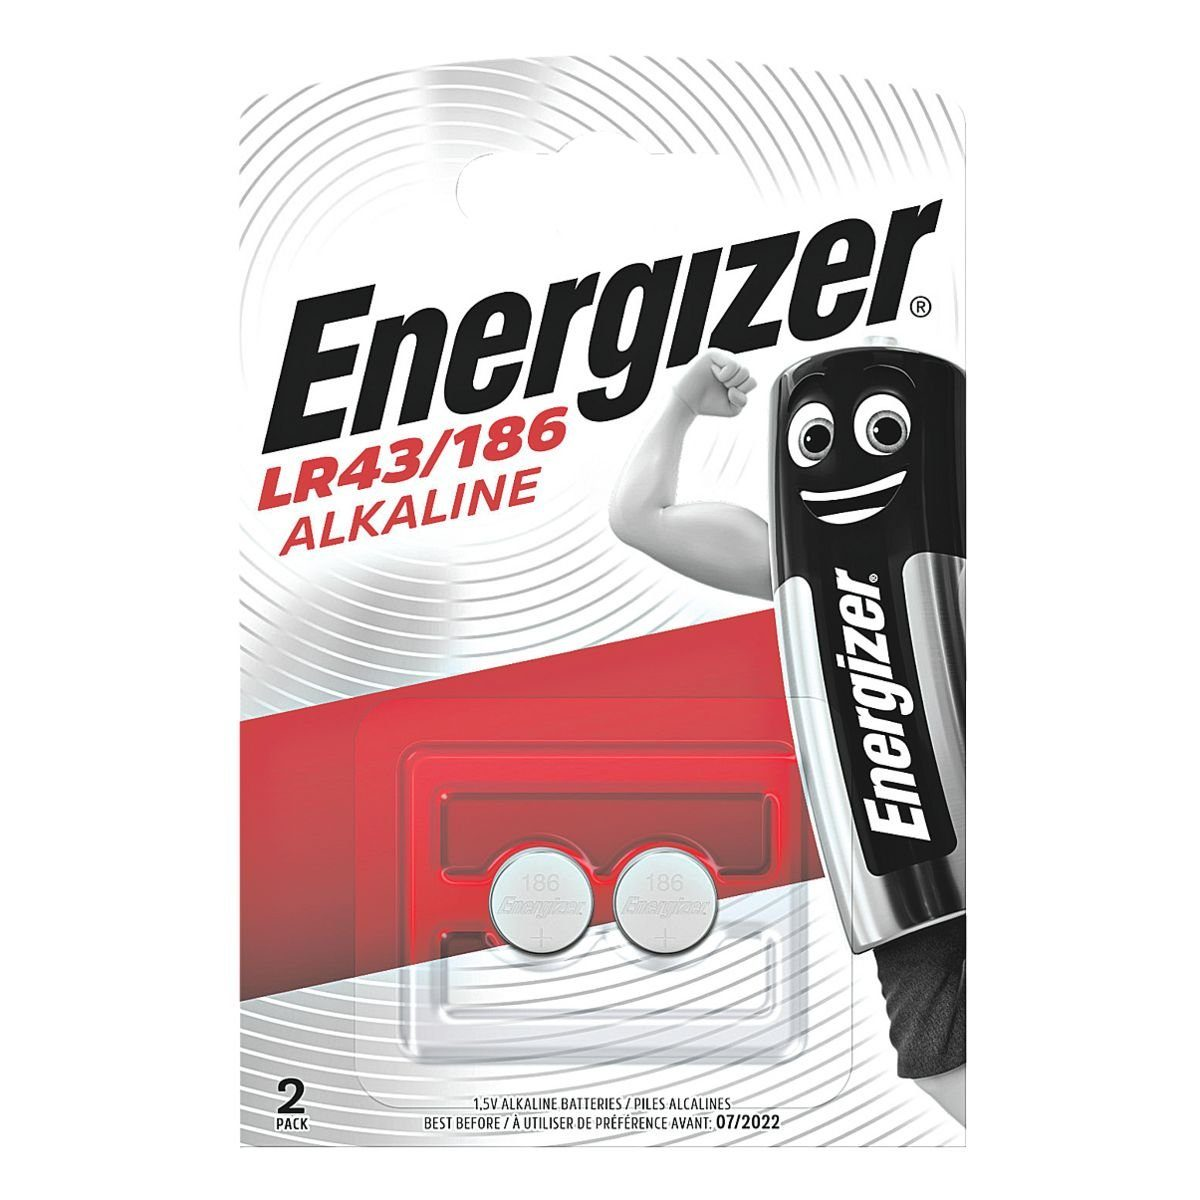 Energizer Knopfzelle »Spezial Alkali« 186 / LR43